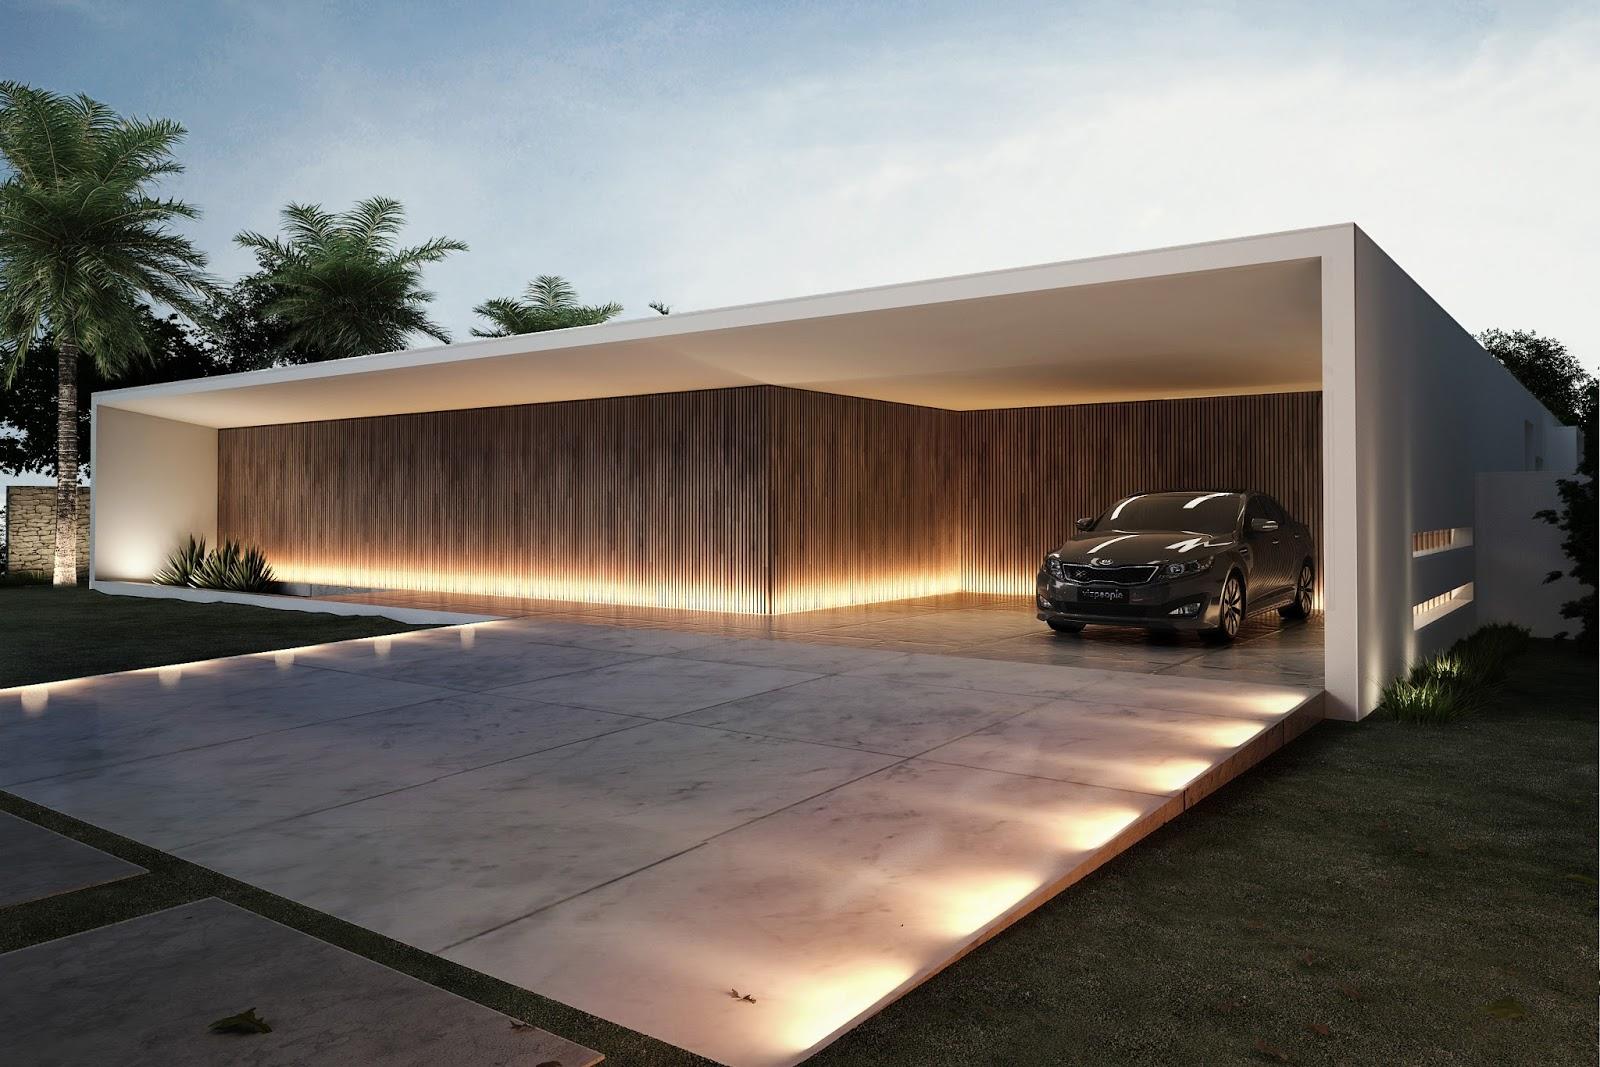 Casa fachada branca minimalista moderna decor salteado 15 for Casas tipo minimalista